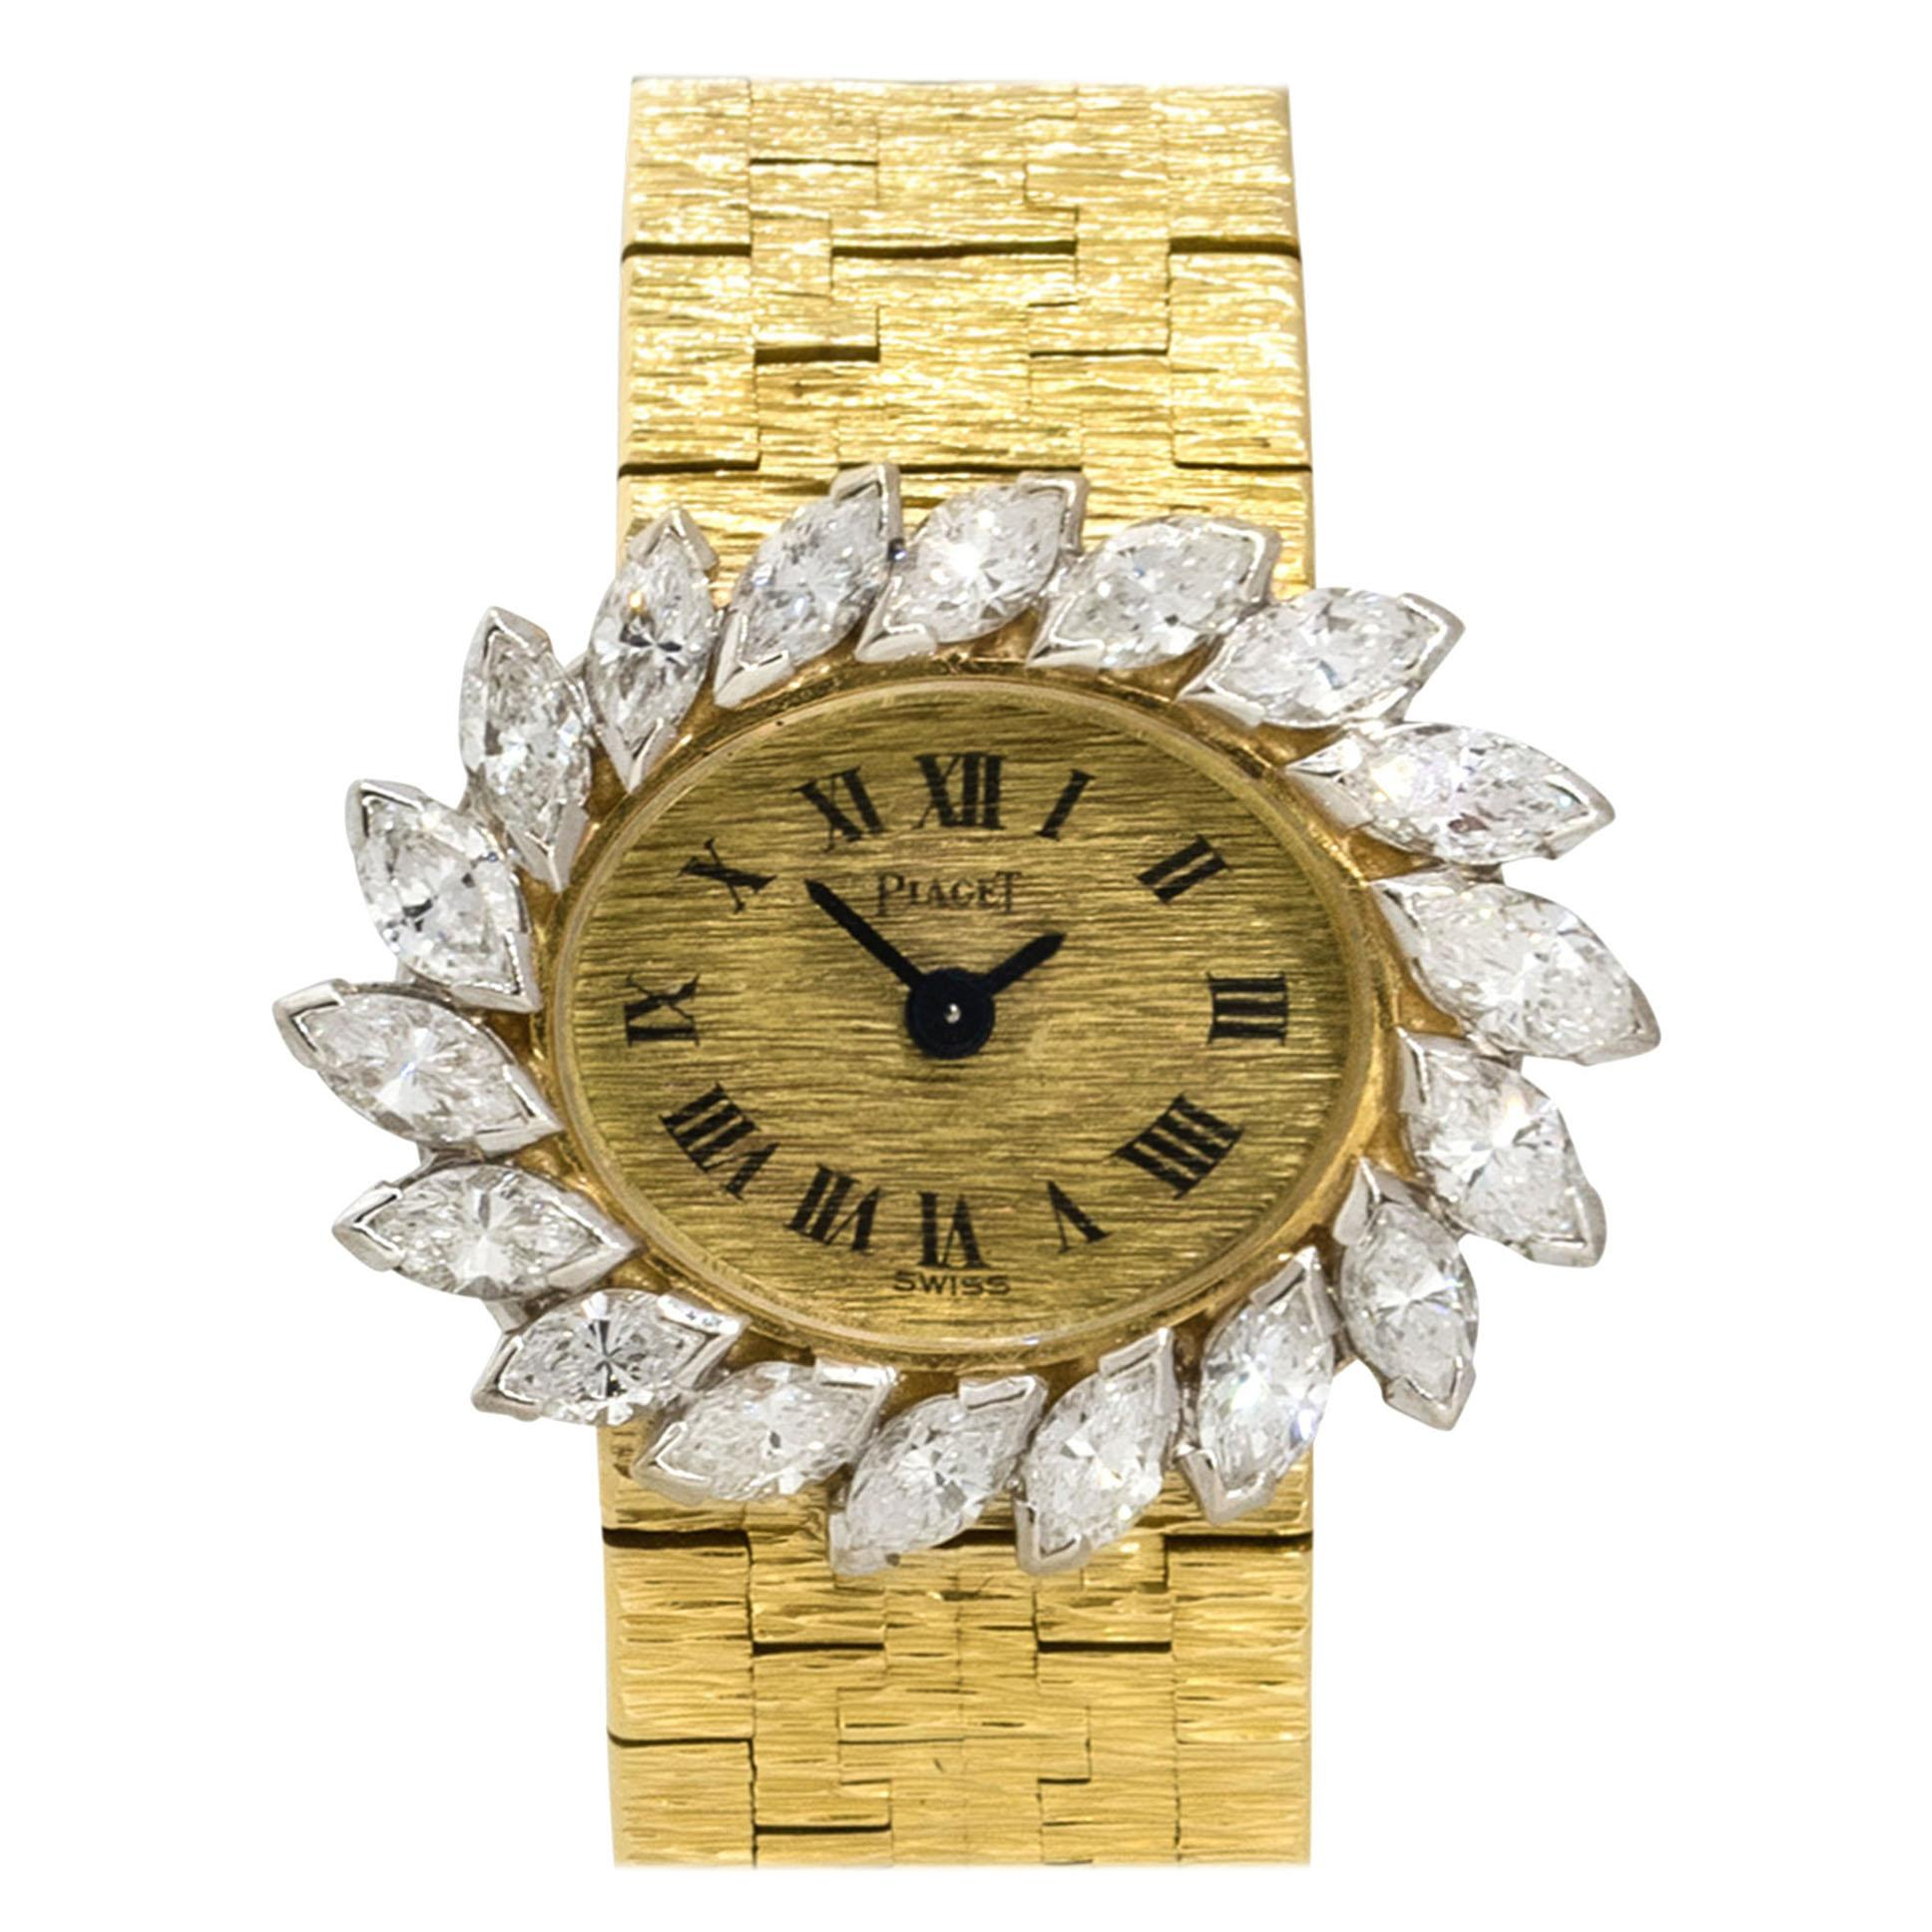 Piaget 3762A6 18k Yellow Gold Spiral Diamond Ladies Watch